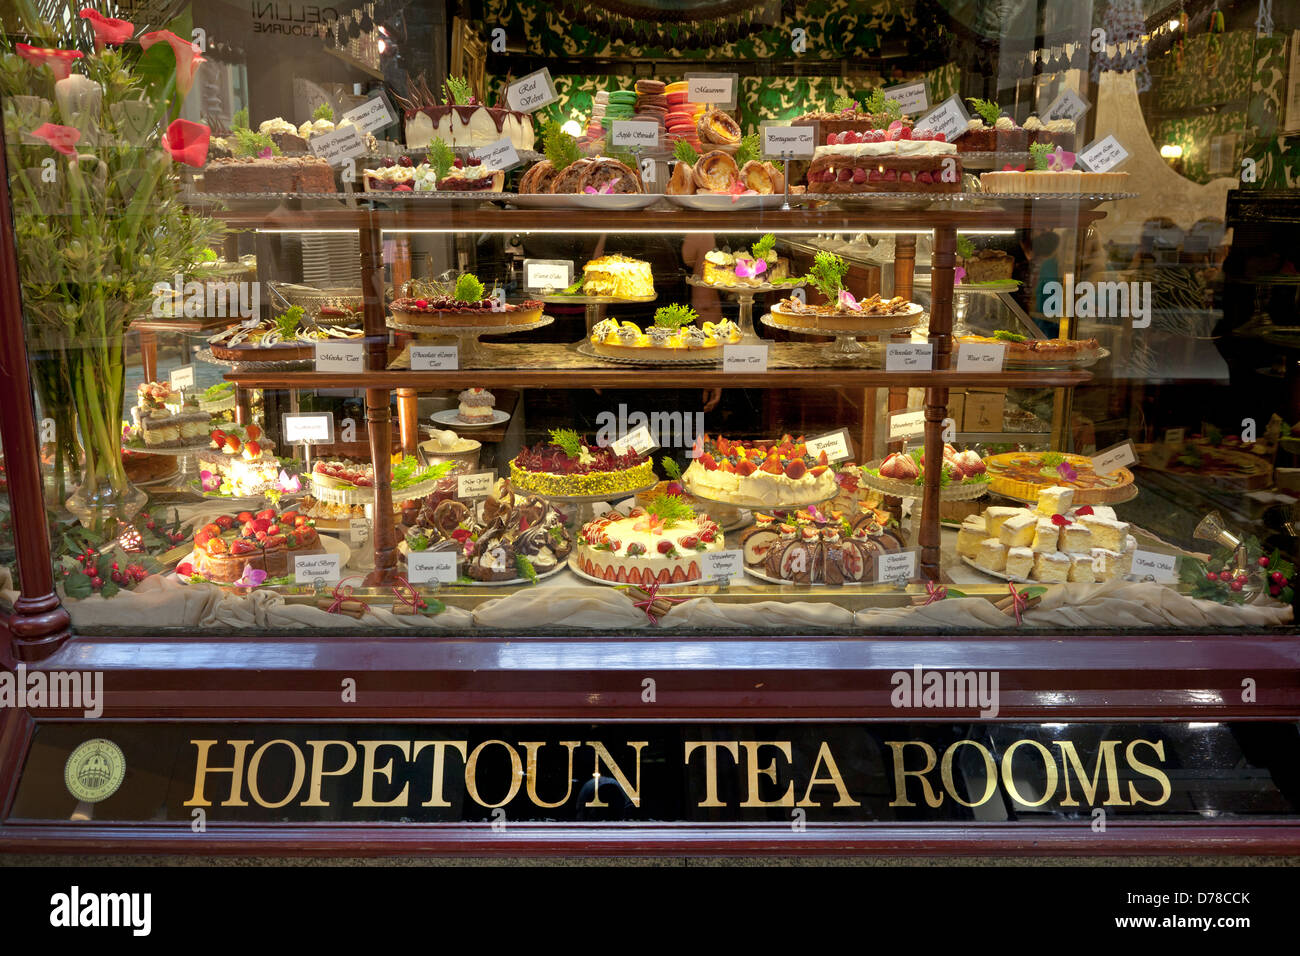 Melbourne Hopetoun Tea Room